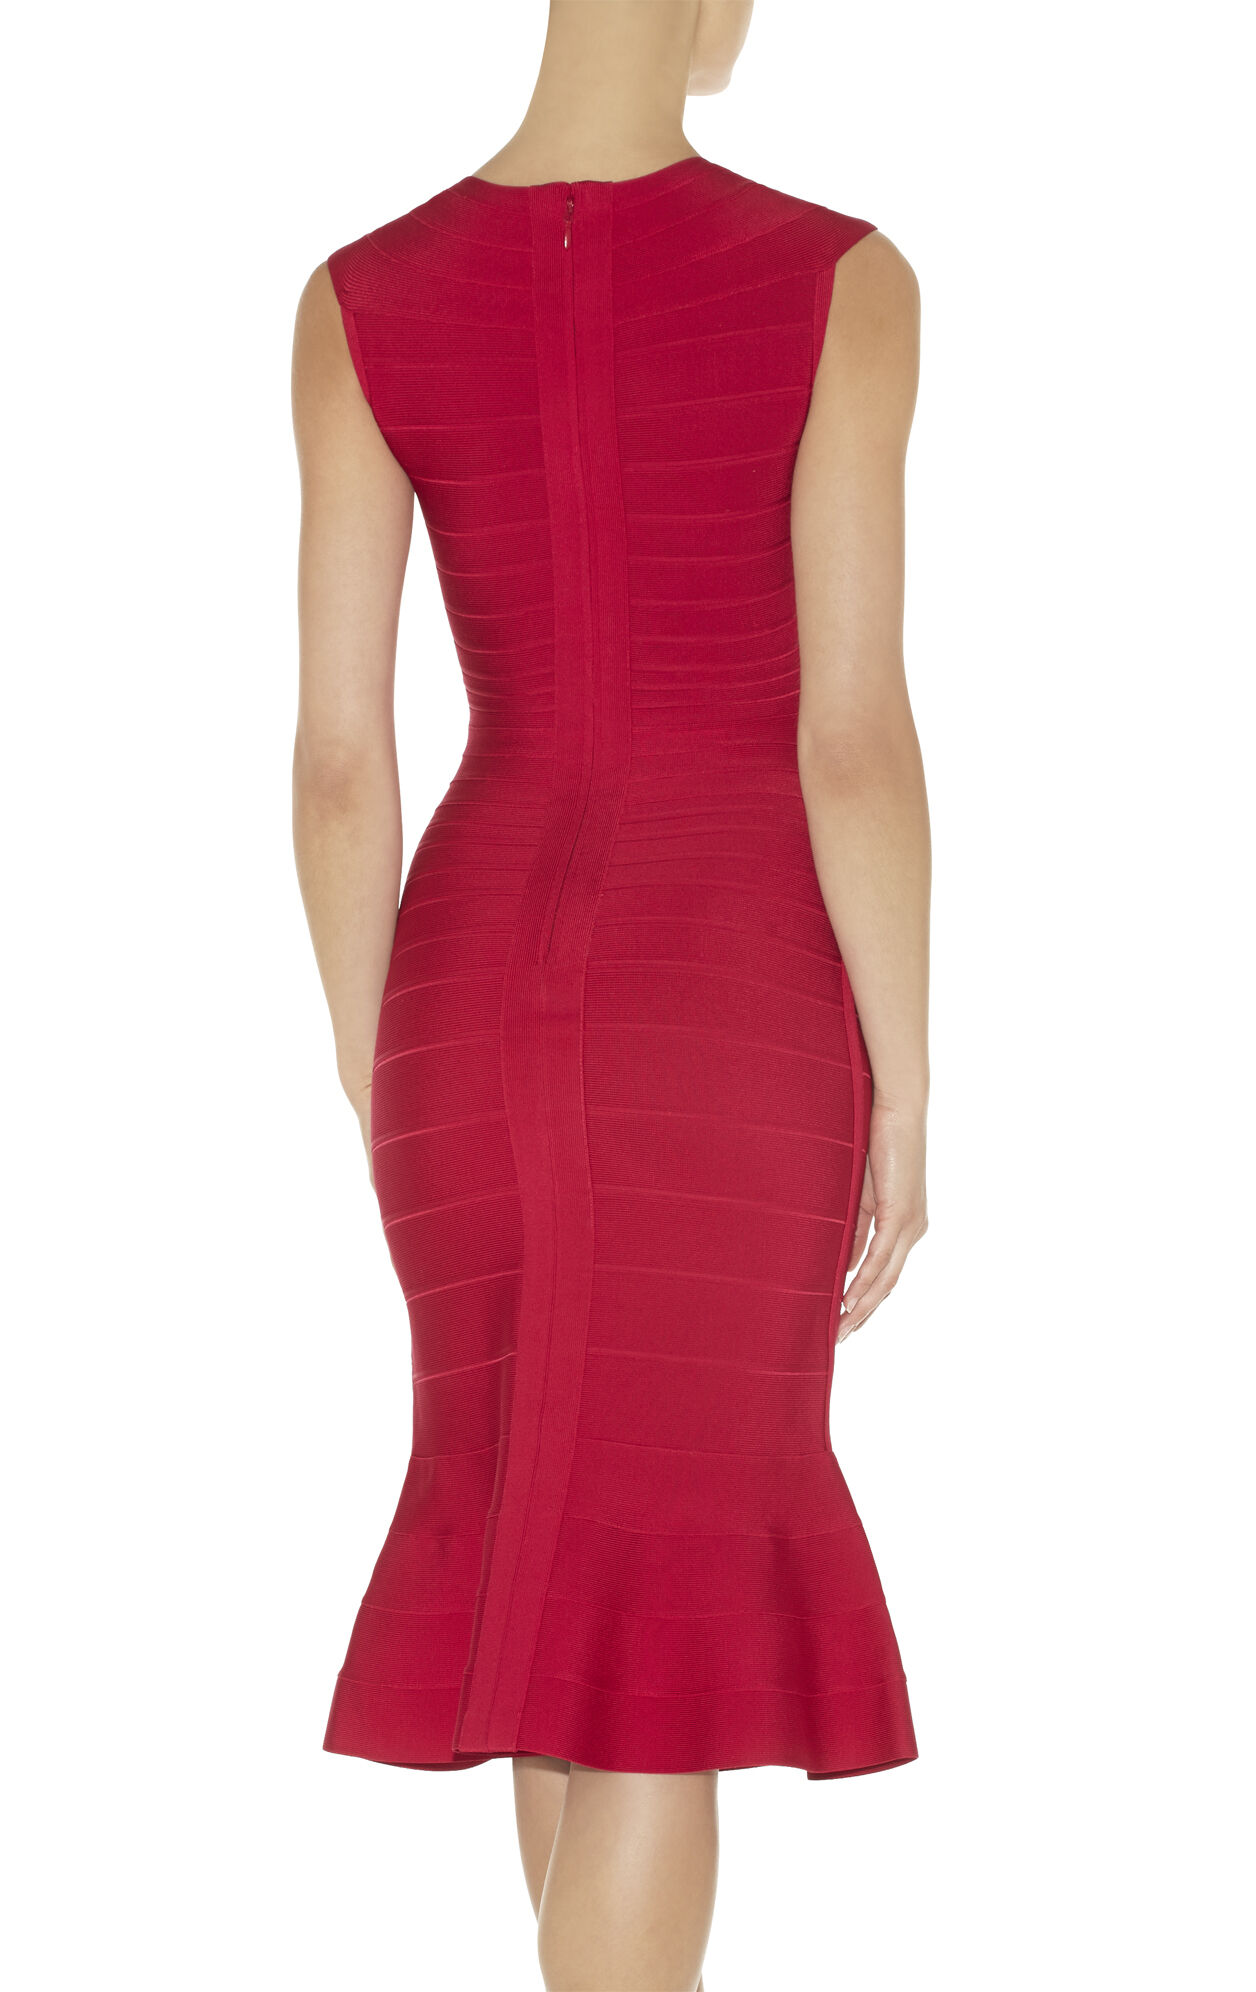 Camillia Signature Bandage Dress